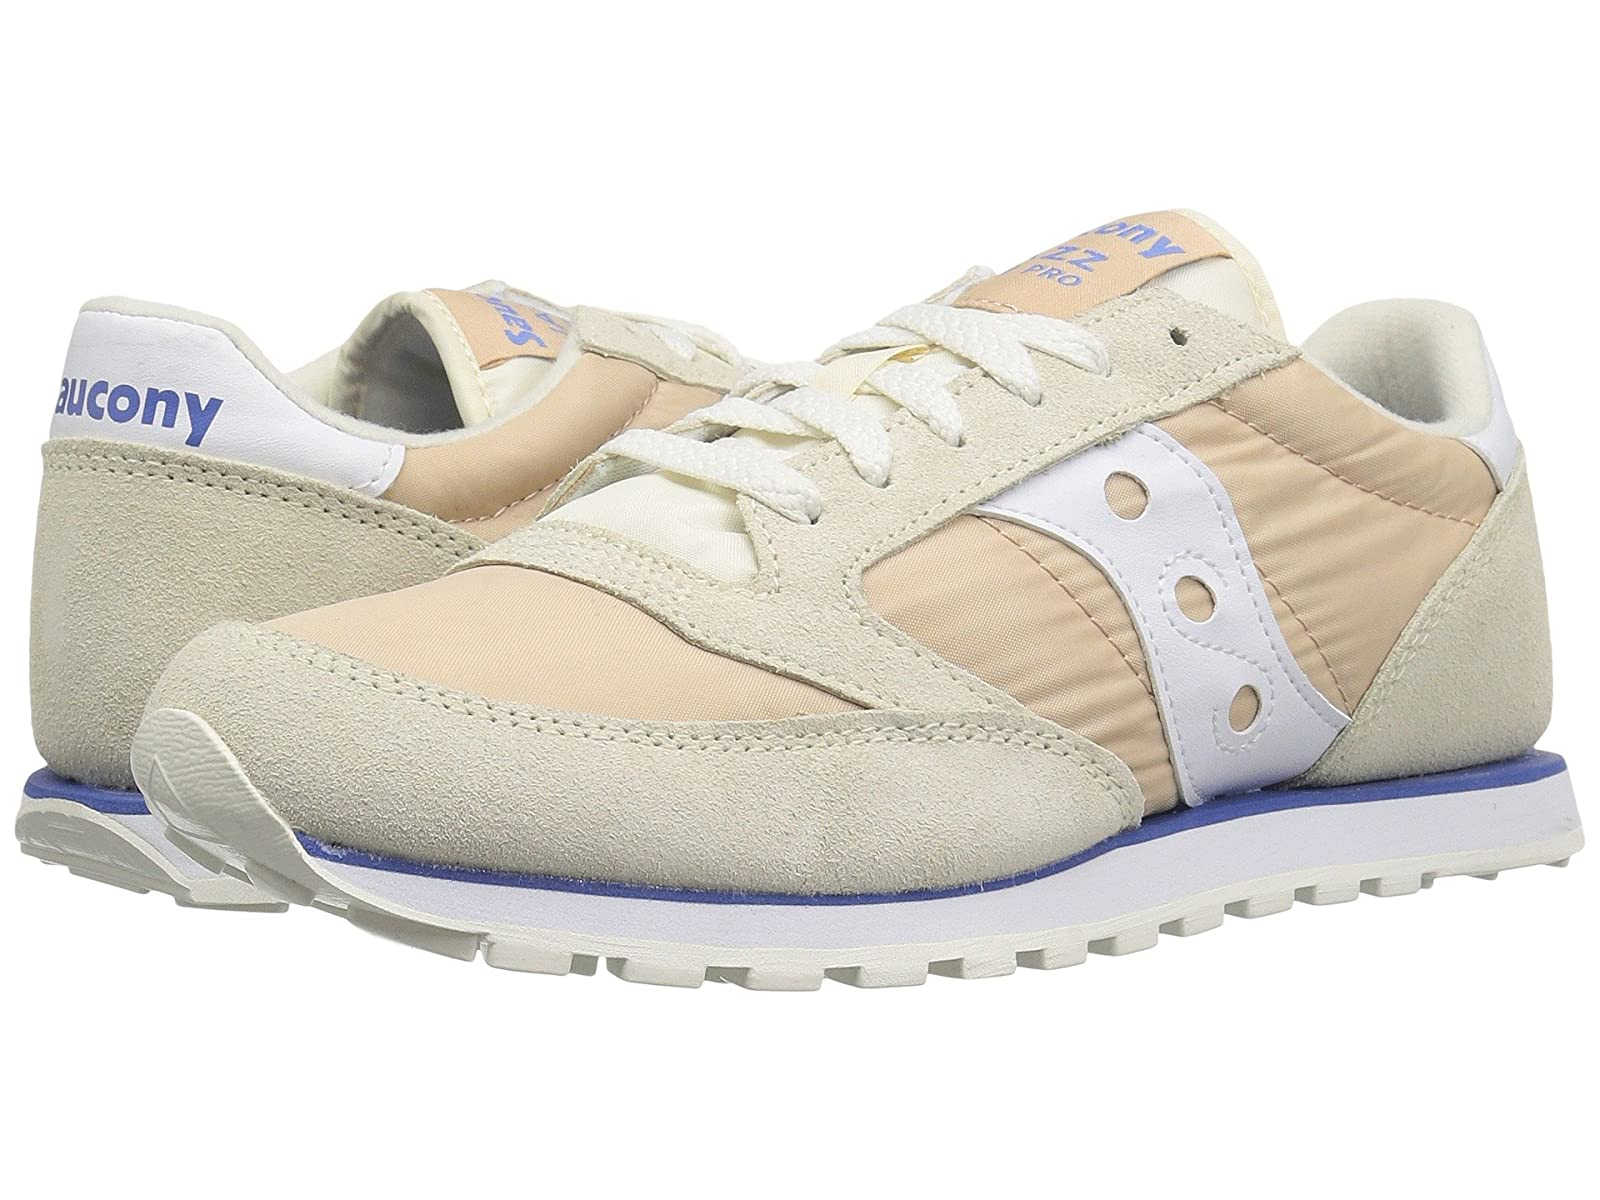 Saucony Originals Jazz Low ProAtmospheric grades have affordable shoes